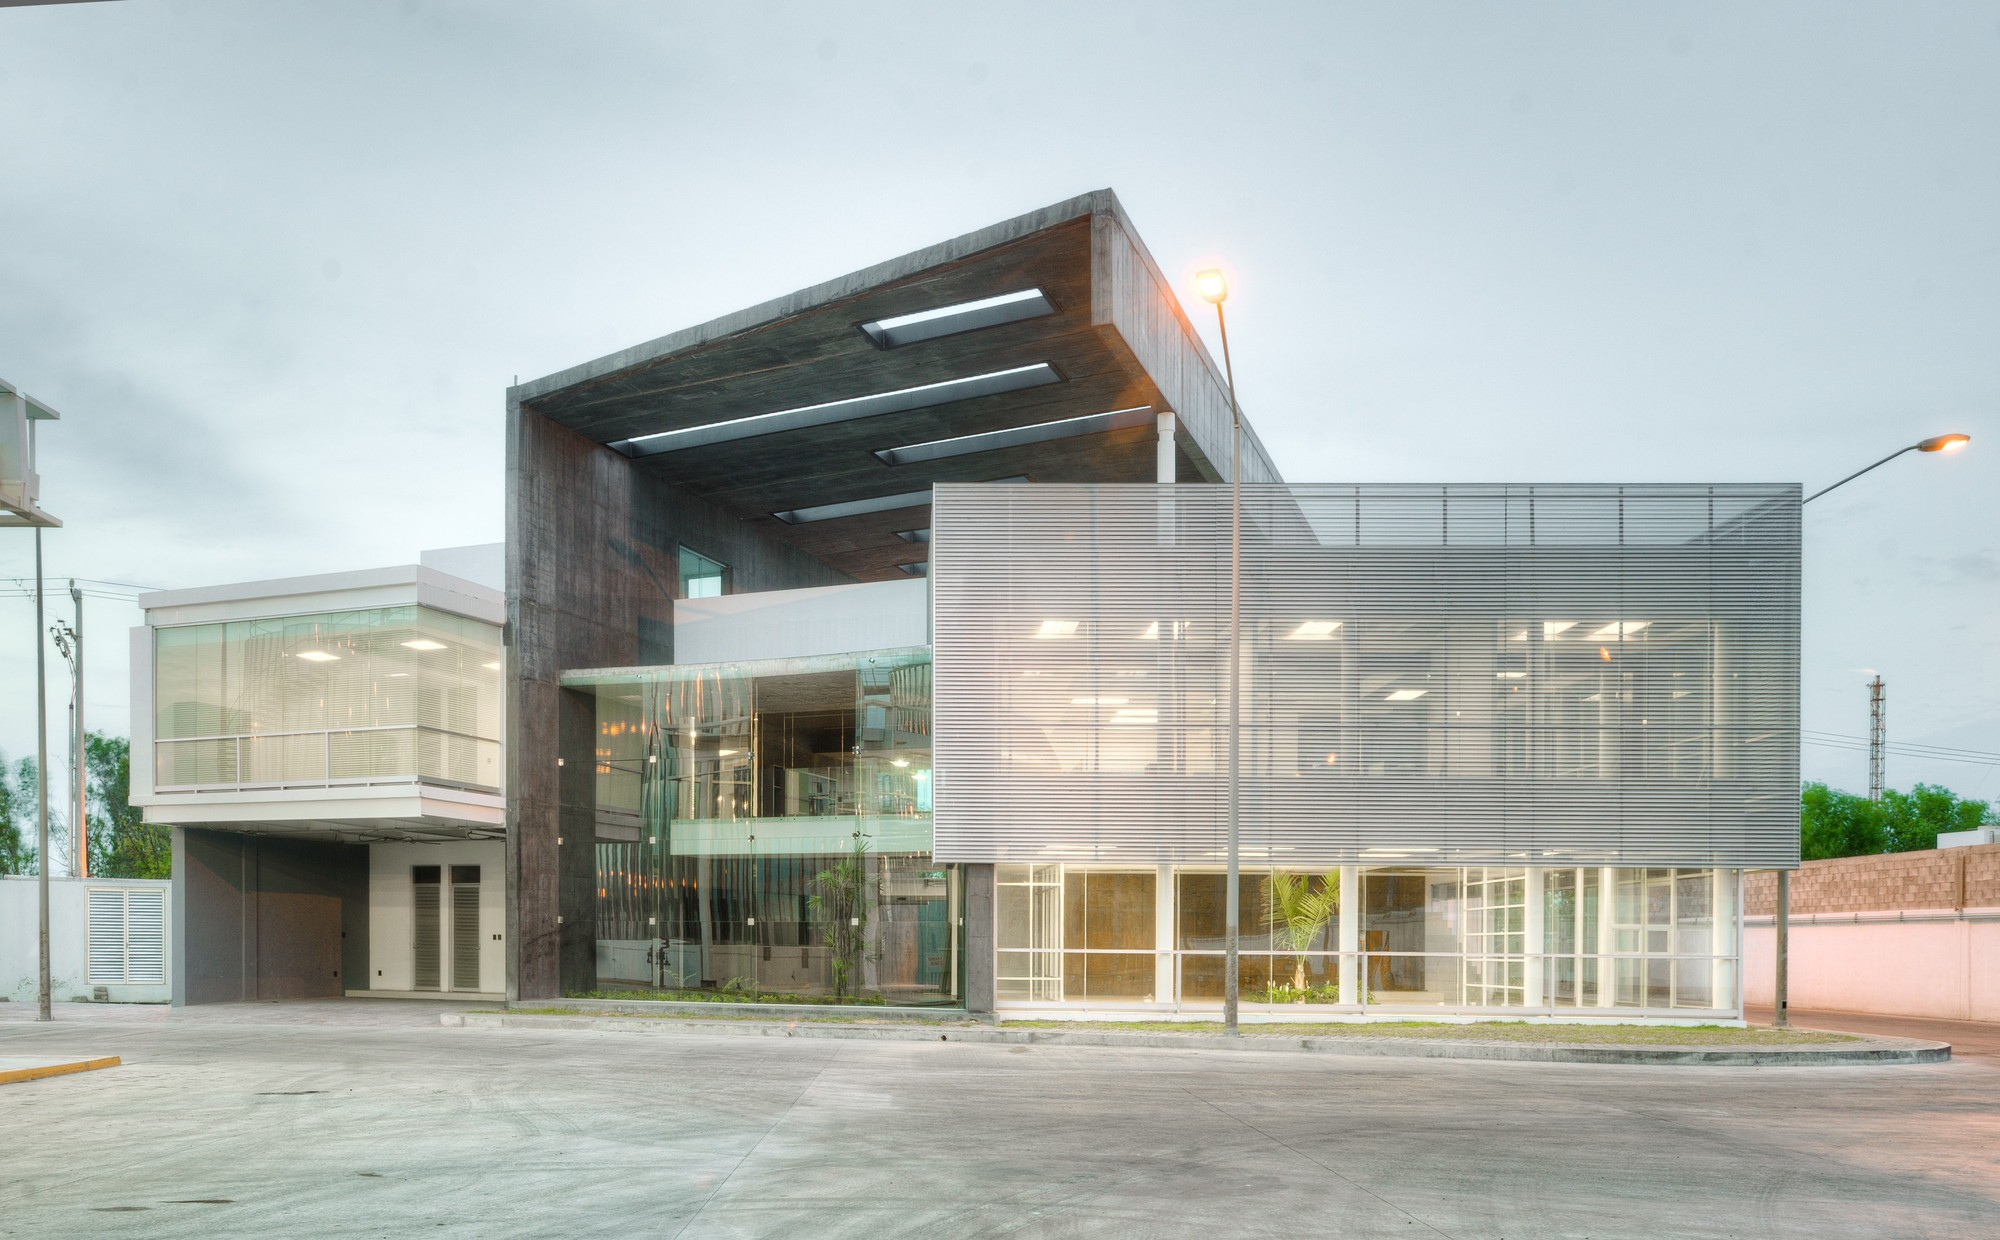 Global Marketing Corp. Headquarters / D4 Arquitectos , Courtesy of D4 Arquitectos